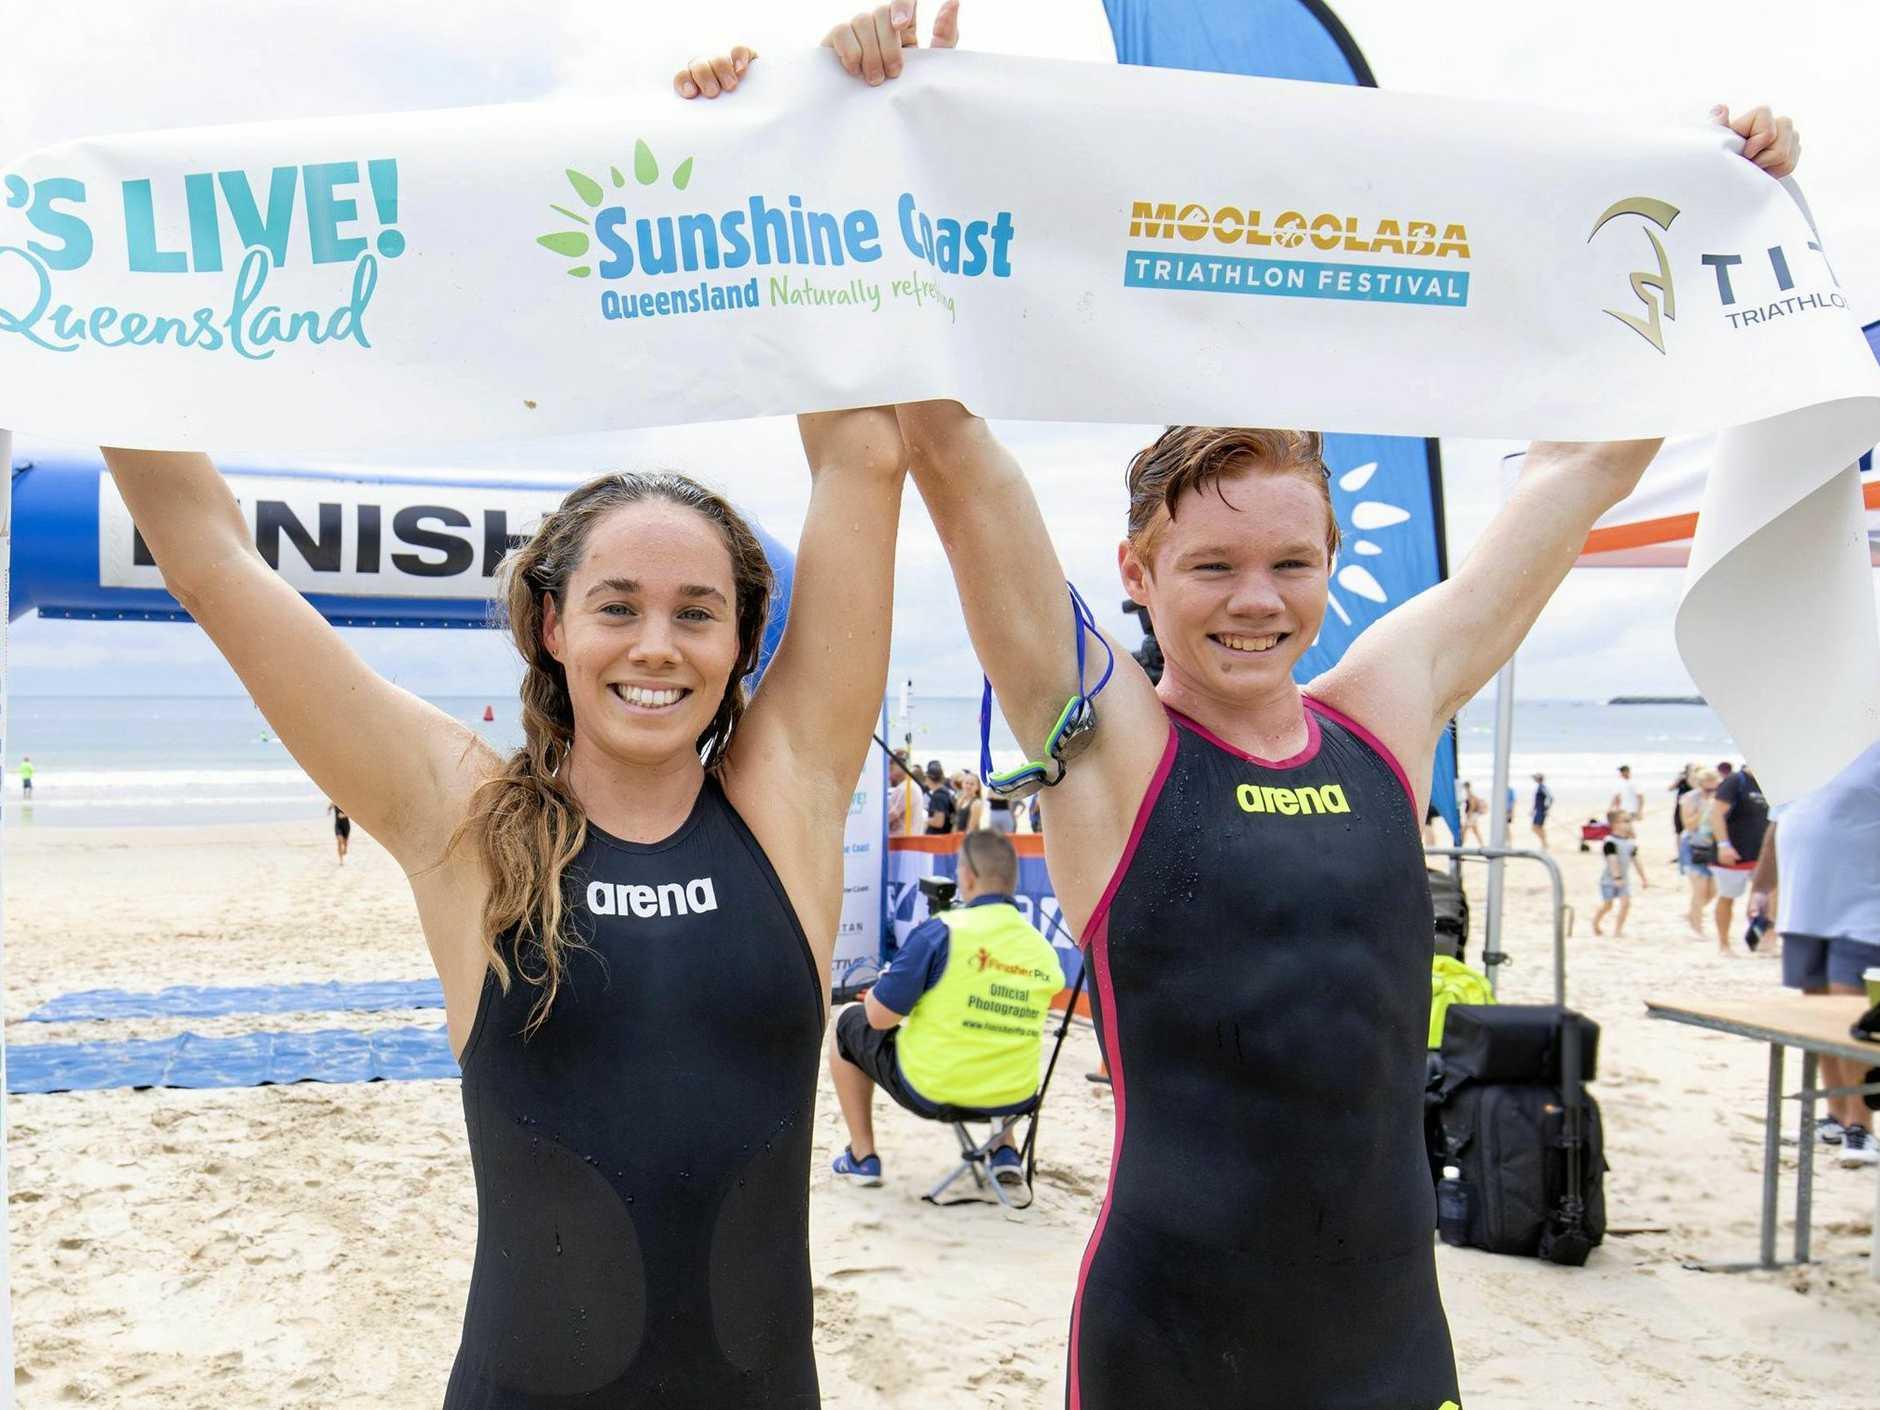 Sunshine Coast youngsters Kolby and Chloe Gubecka won the Titan Mooloolaba Ocean Swim  during the 2019 Mooloolaba Triathlon Festival